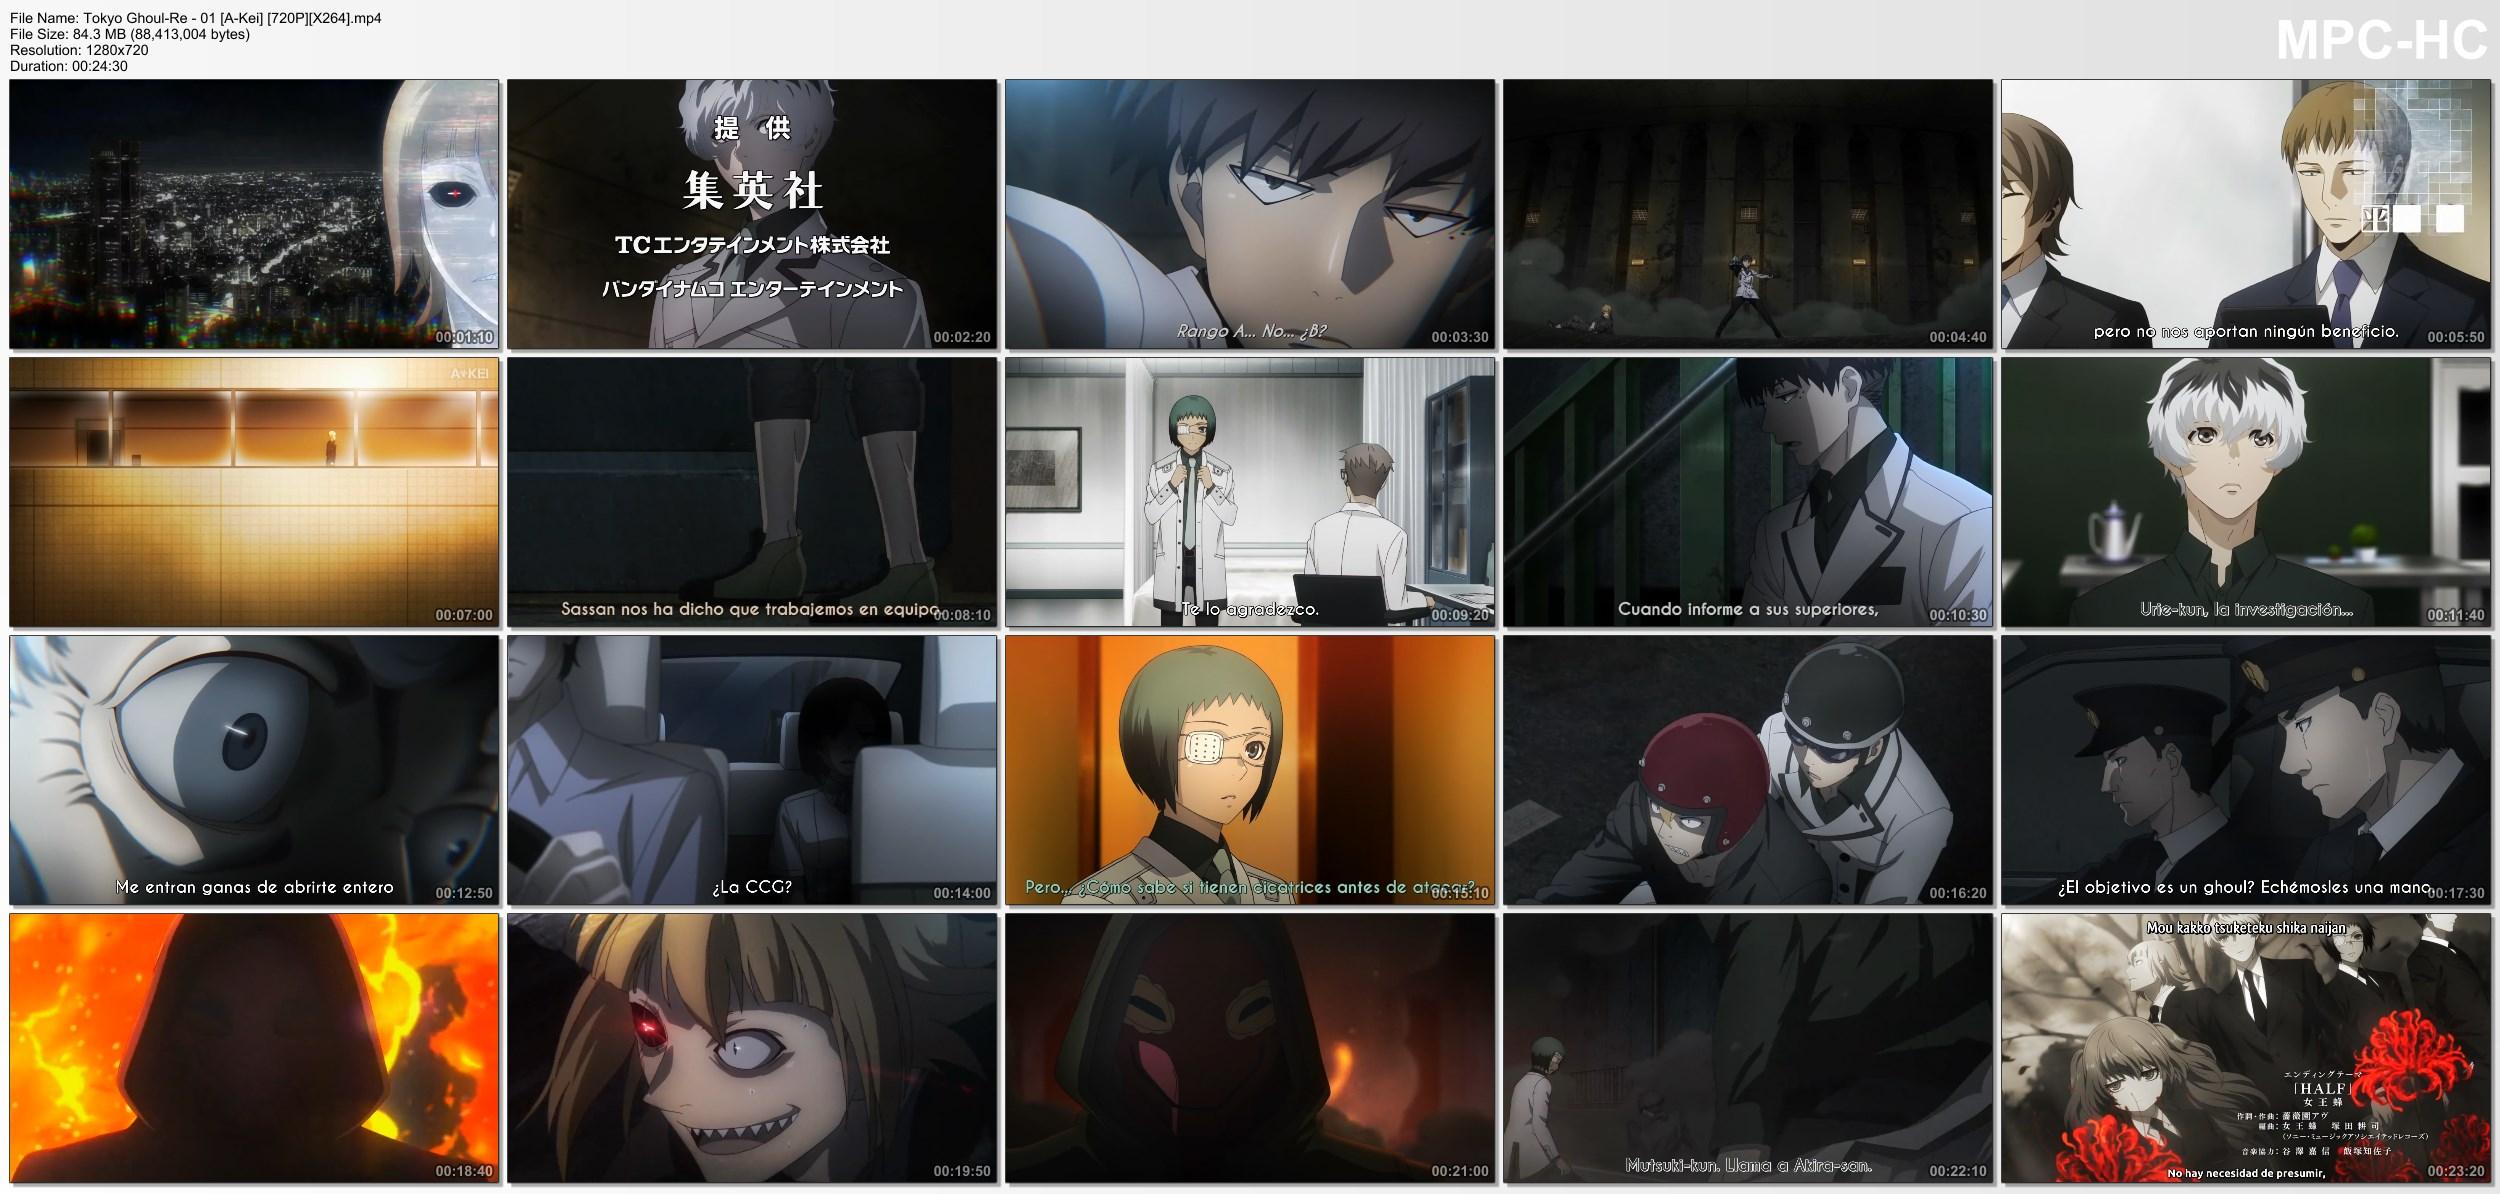 PrDzjgvBkdKDQ - [Aporte] Tokyo Ghoul:re [12/12][85MB][HDL][MEGA][Concluido] - Anime Ligero [Descargas]